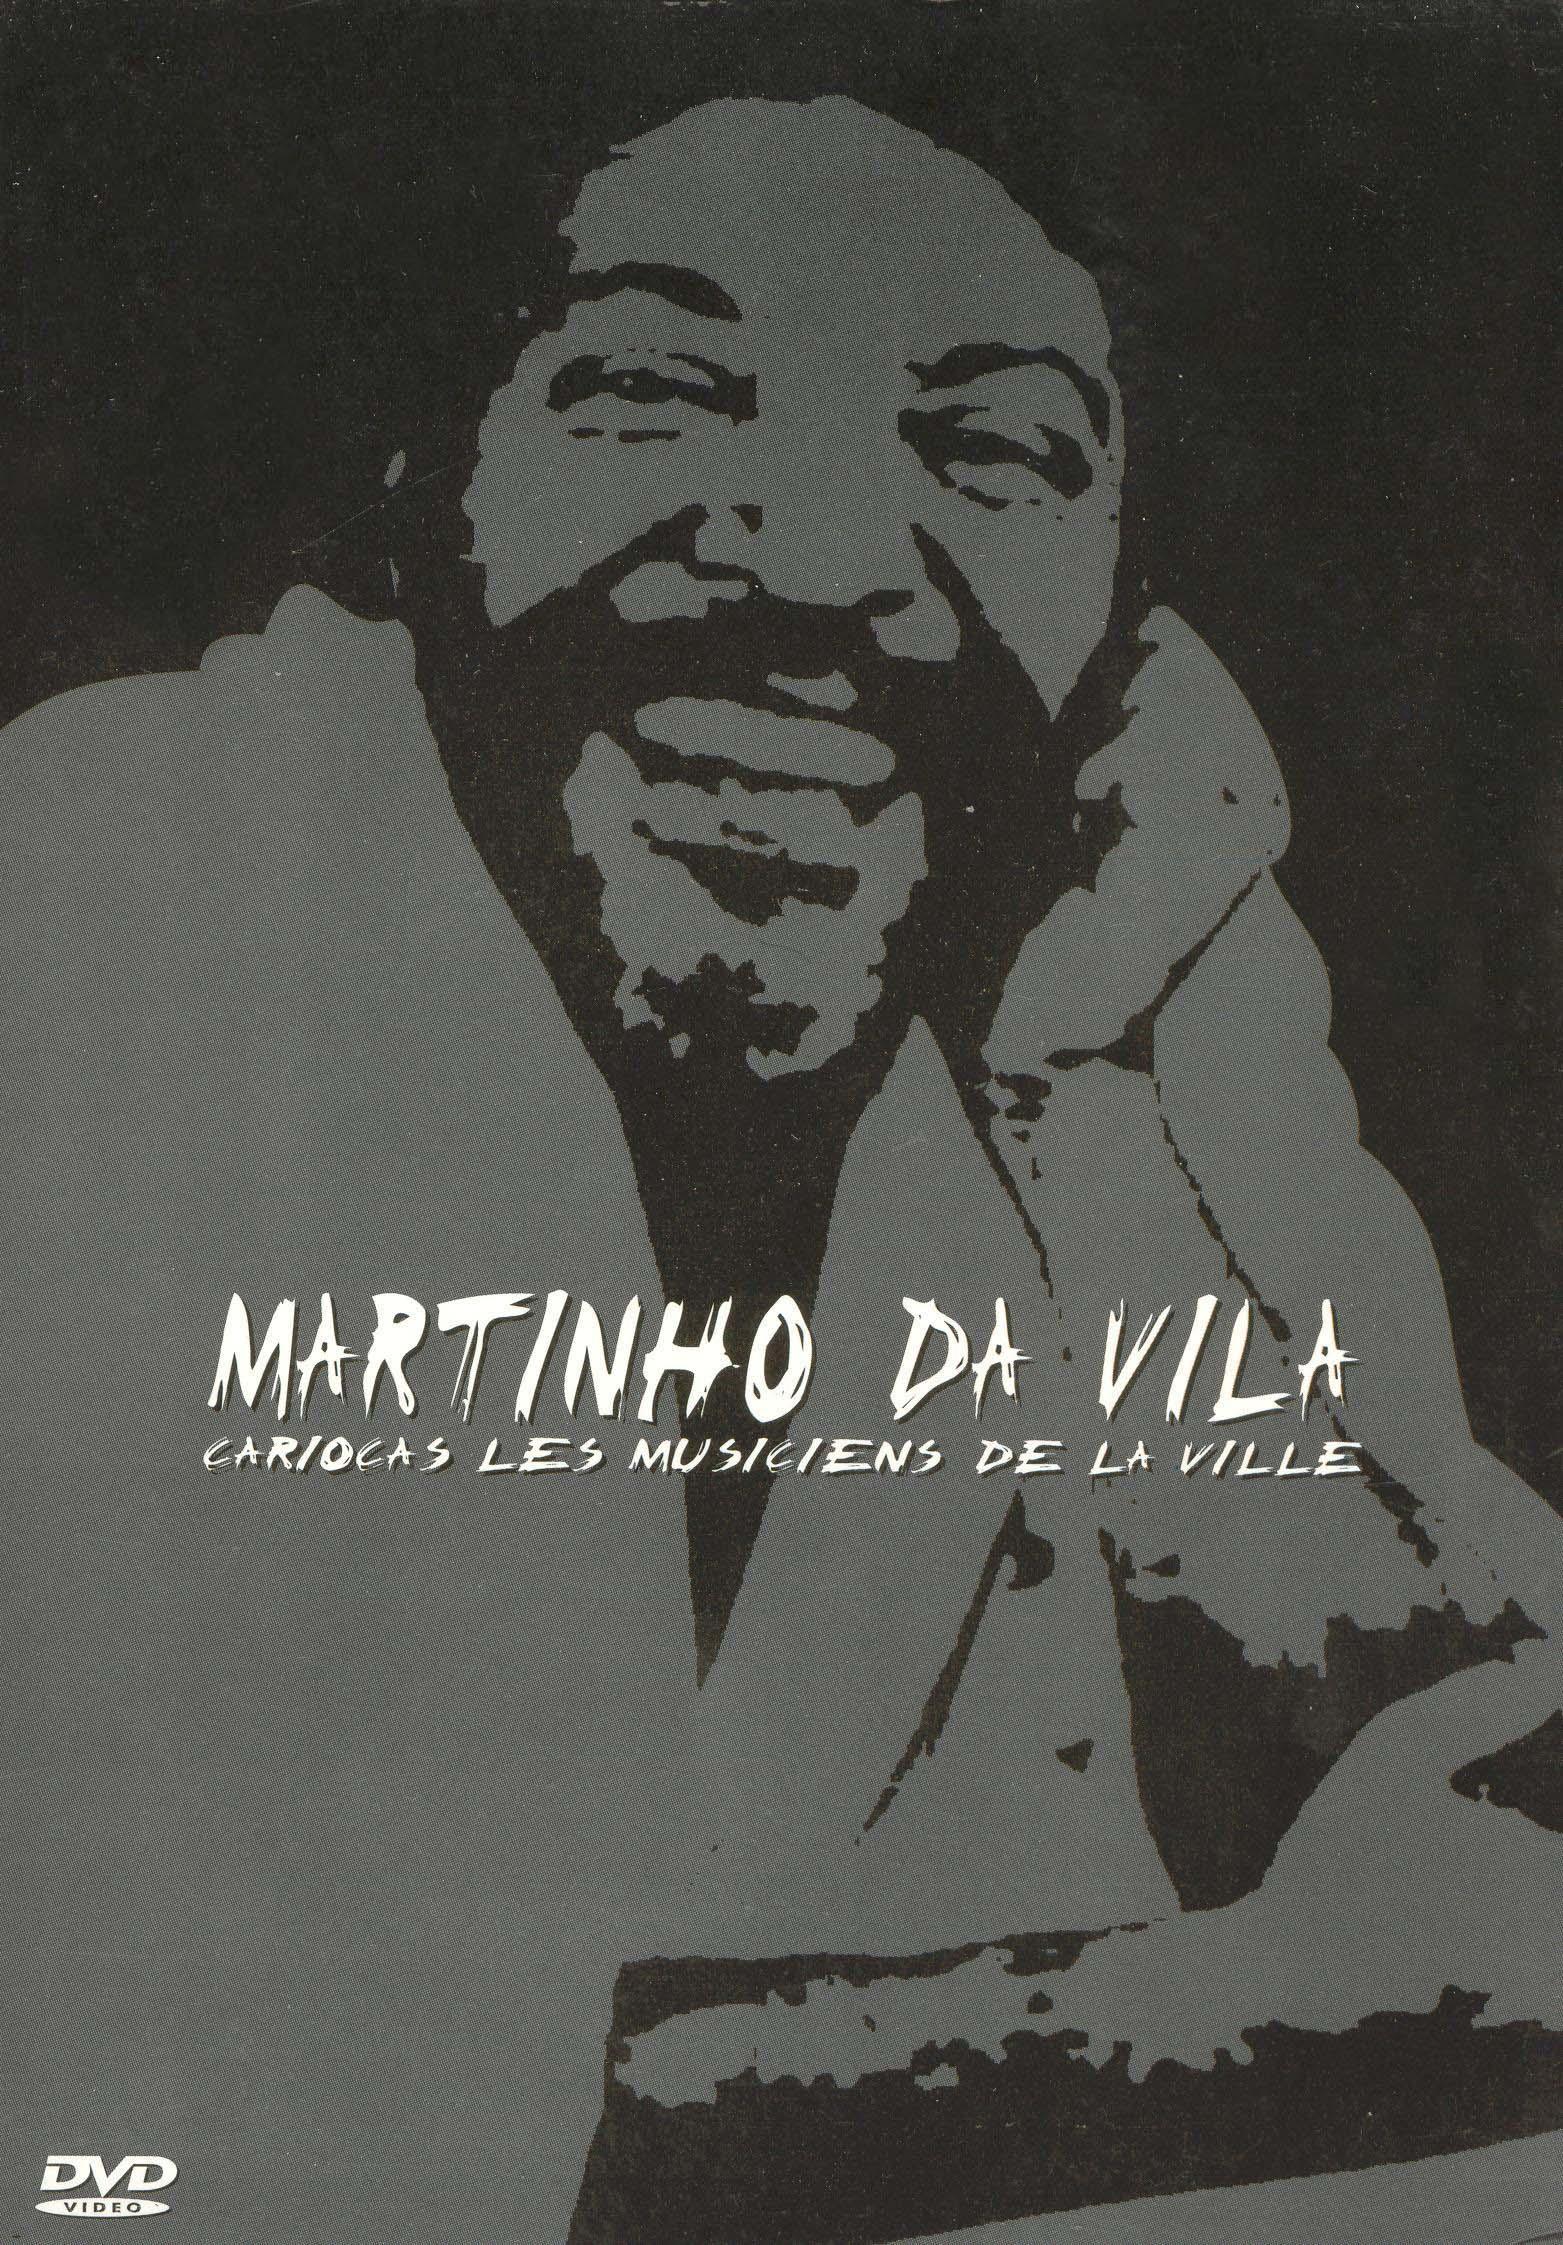 Martinho da Vila: Cariocas les Musiciens de la Ville